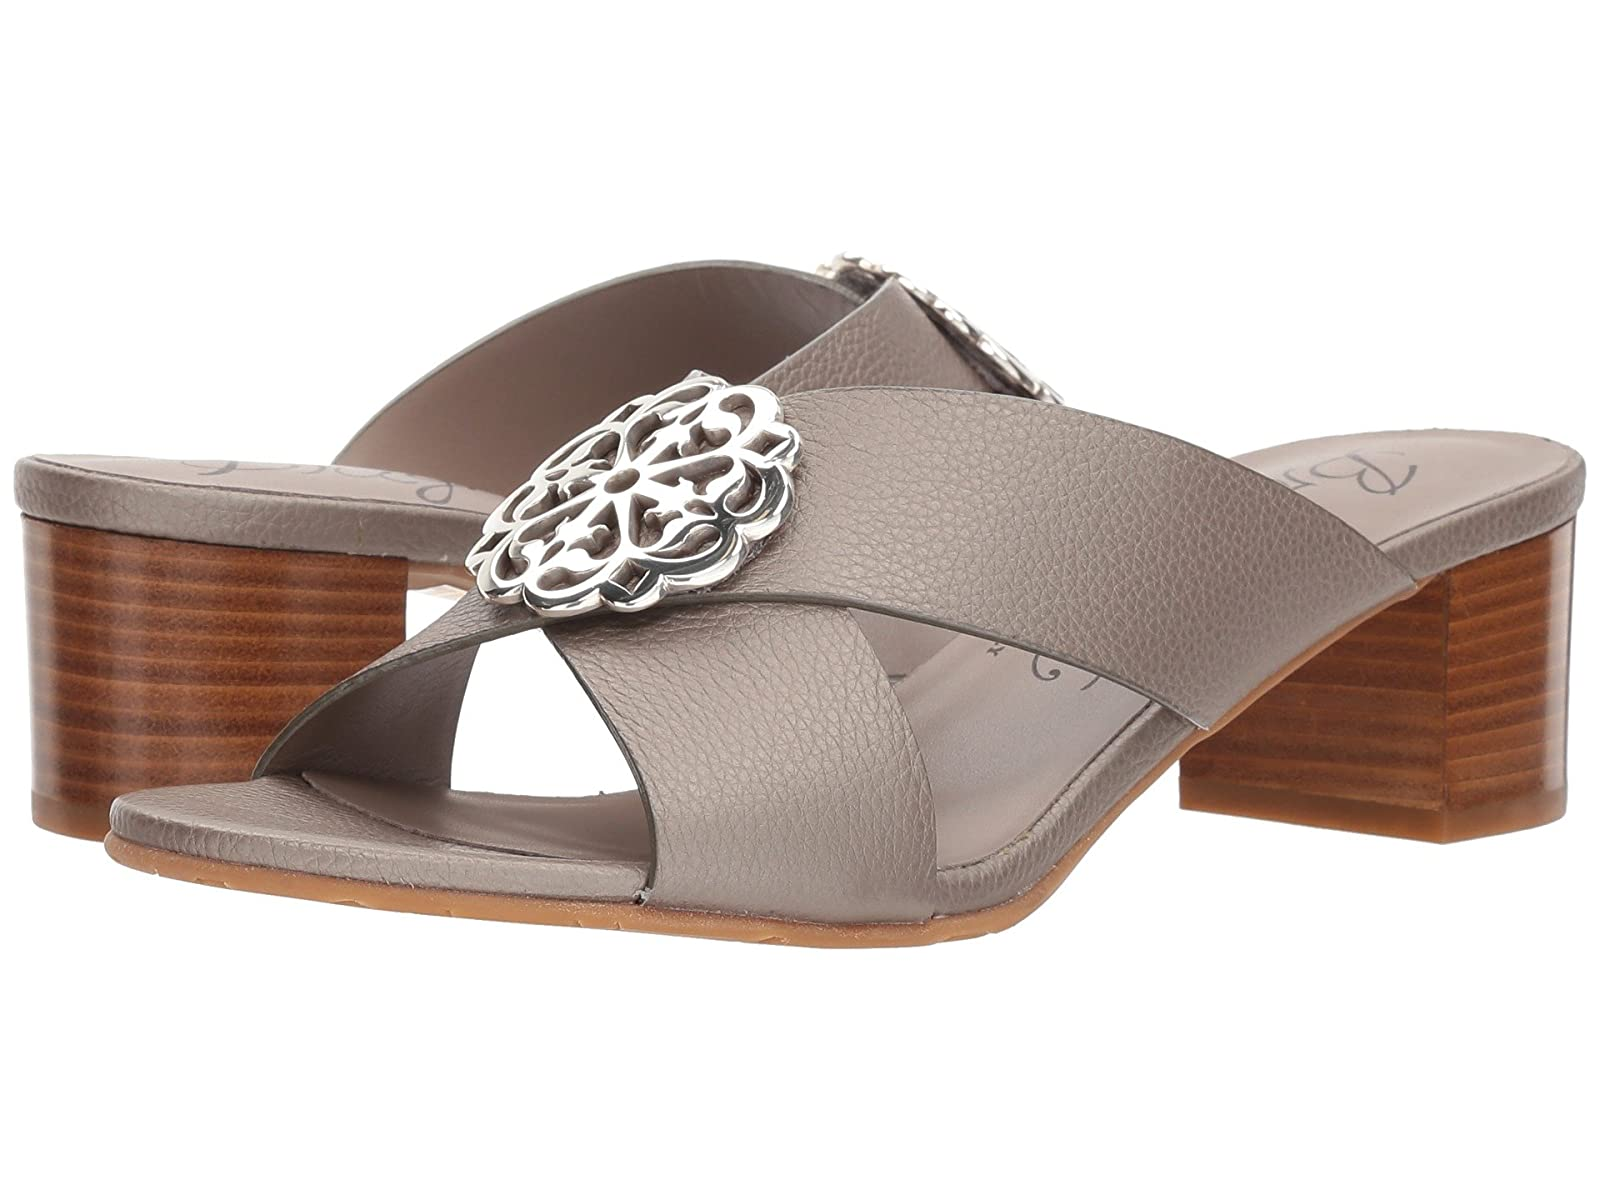 Brighton AlisonAtmospheric grades have affordable shoes